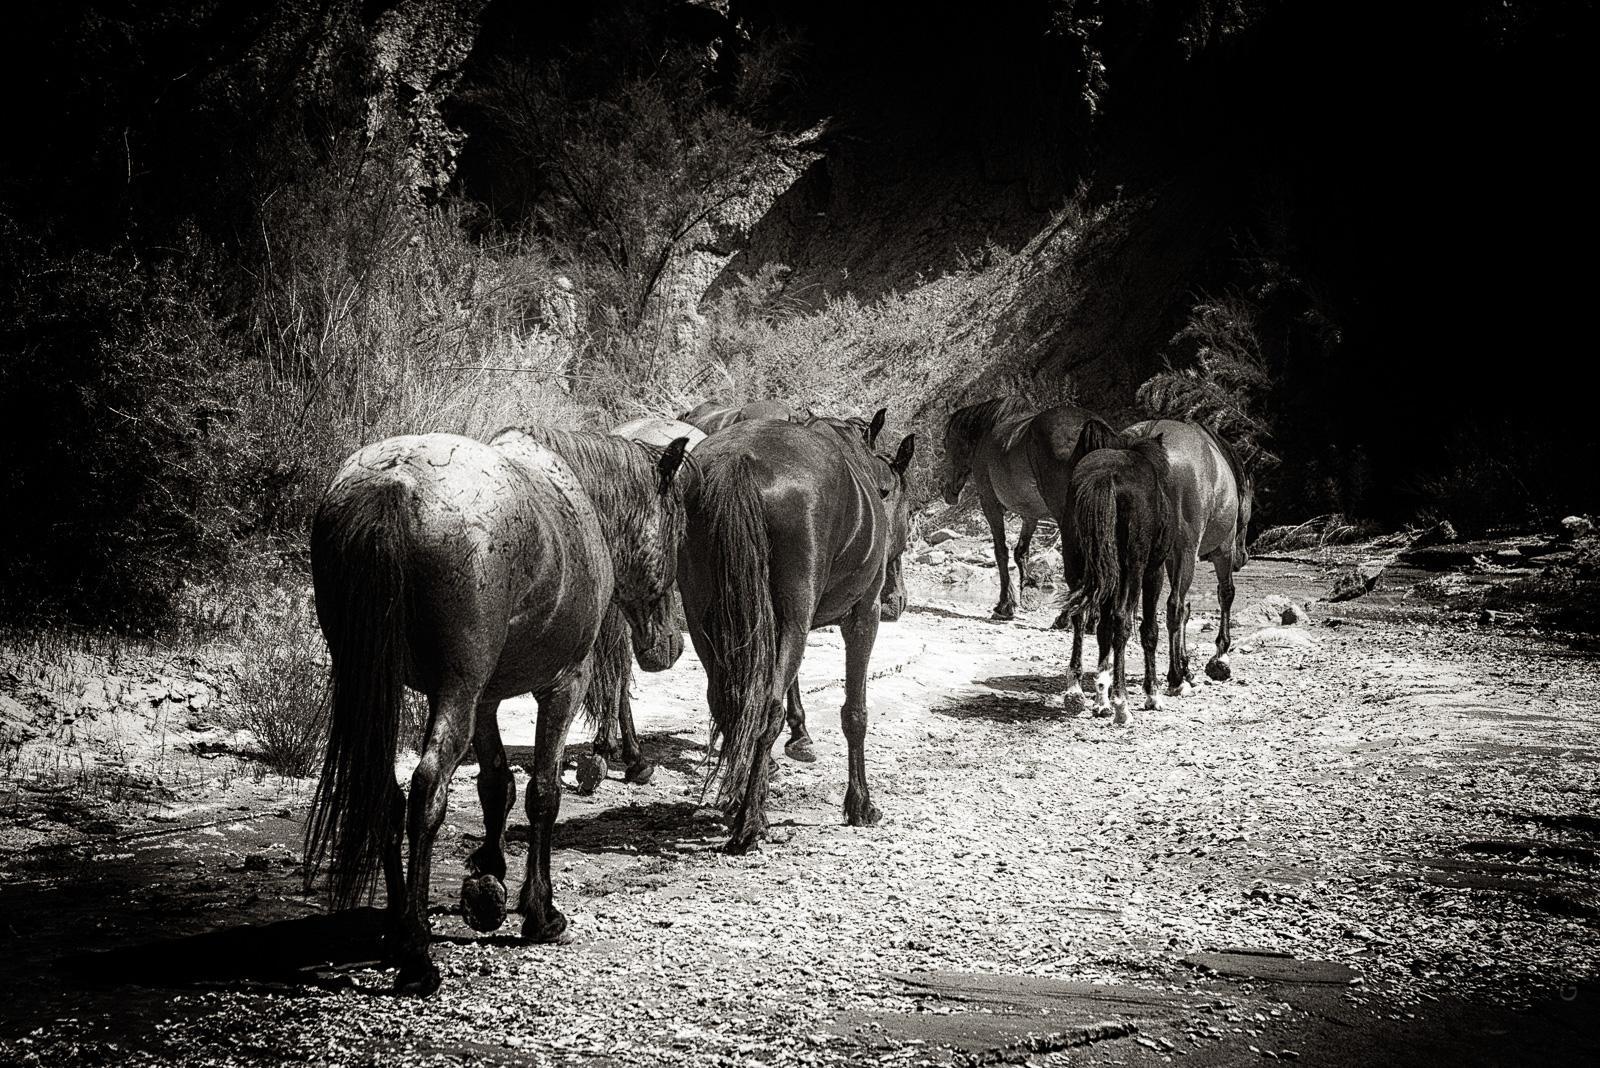 Colorado Wild Horses Photo Tour Big Sun Photography Tours